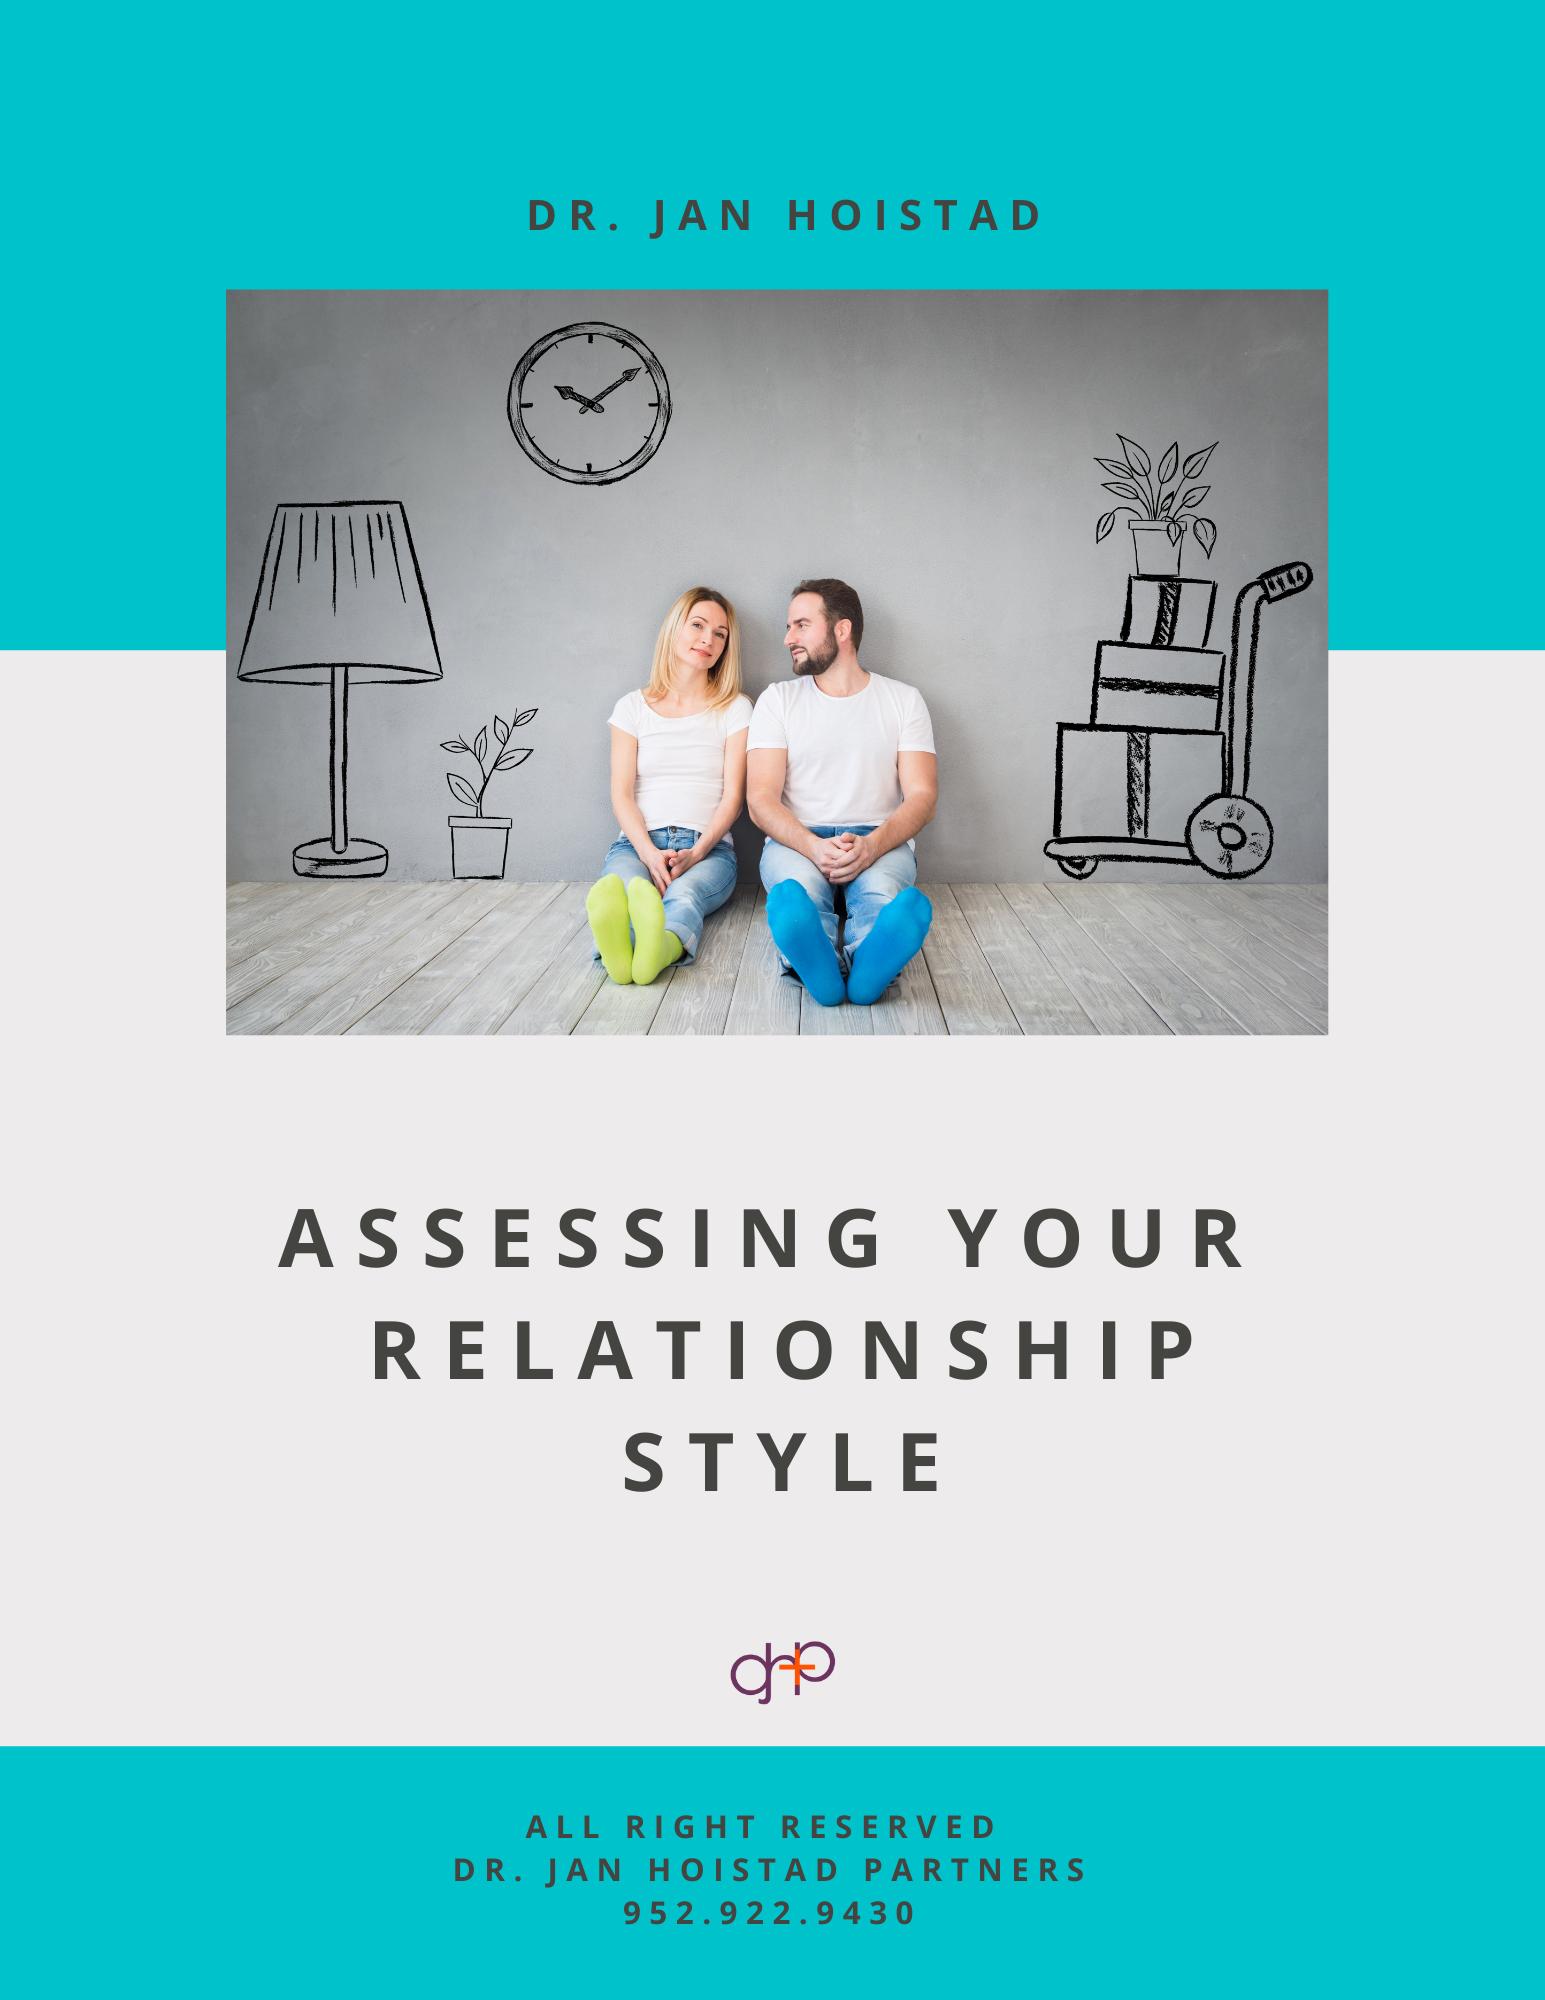 Dr Jan Hoistad - Assessing Relationship